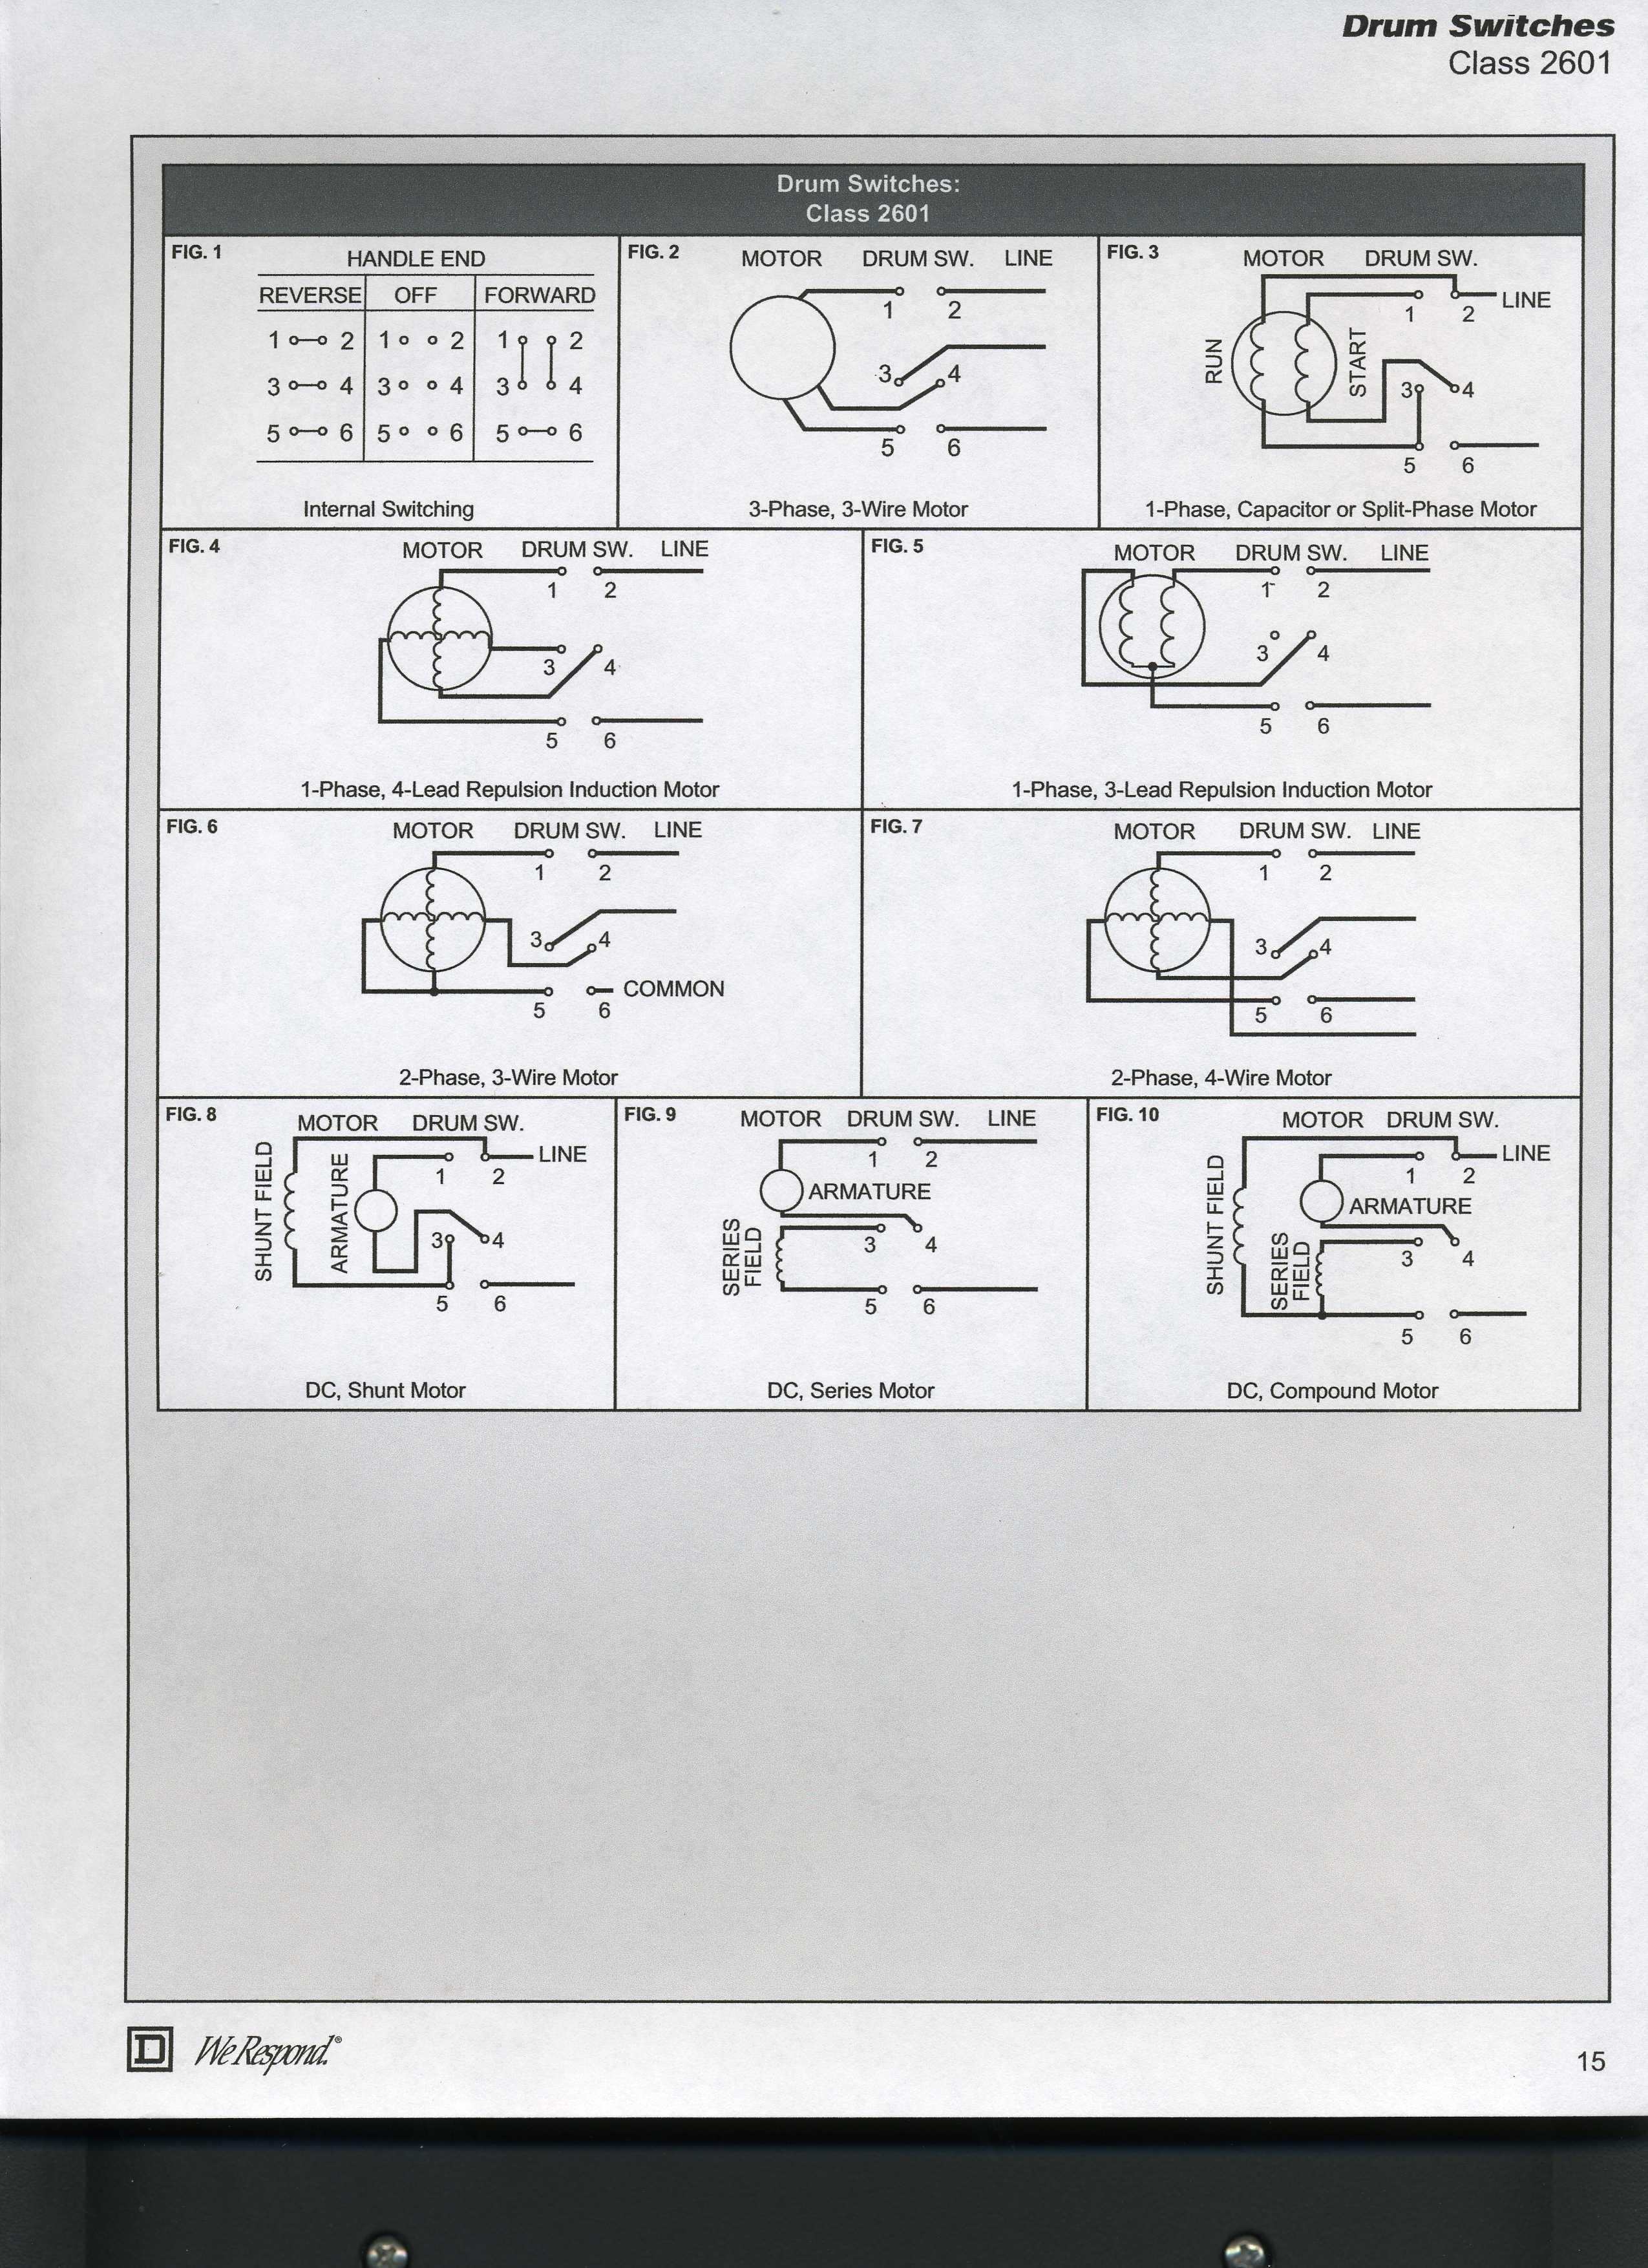 3 Wire Condenser Fan Motor Wiring Diagram Inspirational Dayton Electric Motor Wiring Diagram & Gallery